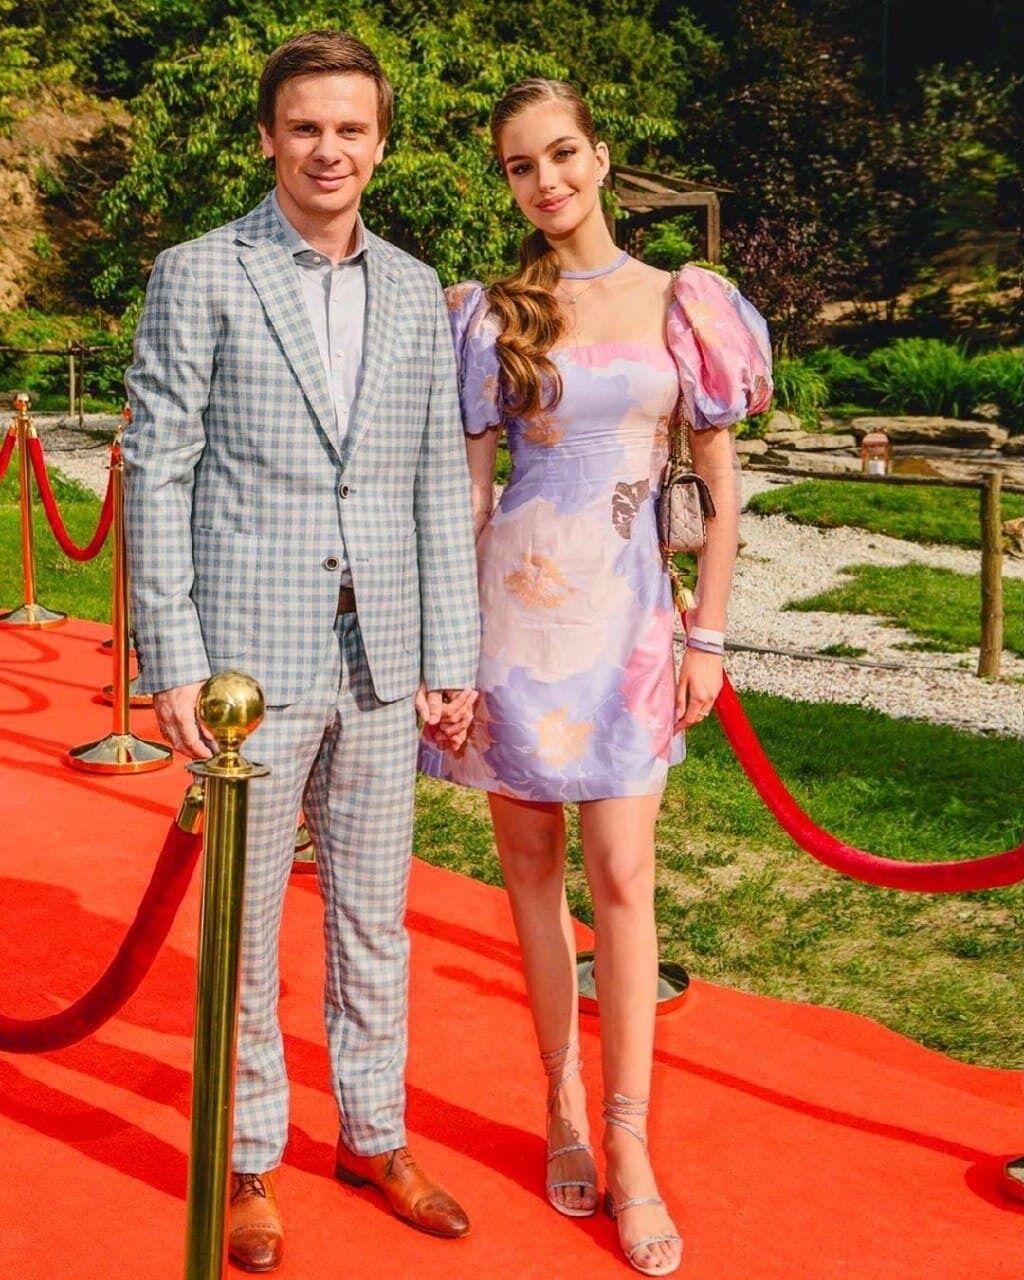 Пара познакомилась в 2016 году на конкурсе красоты